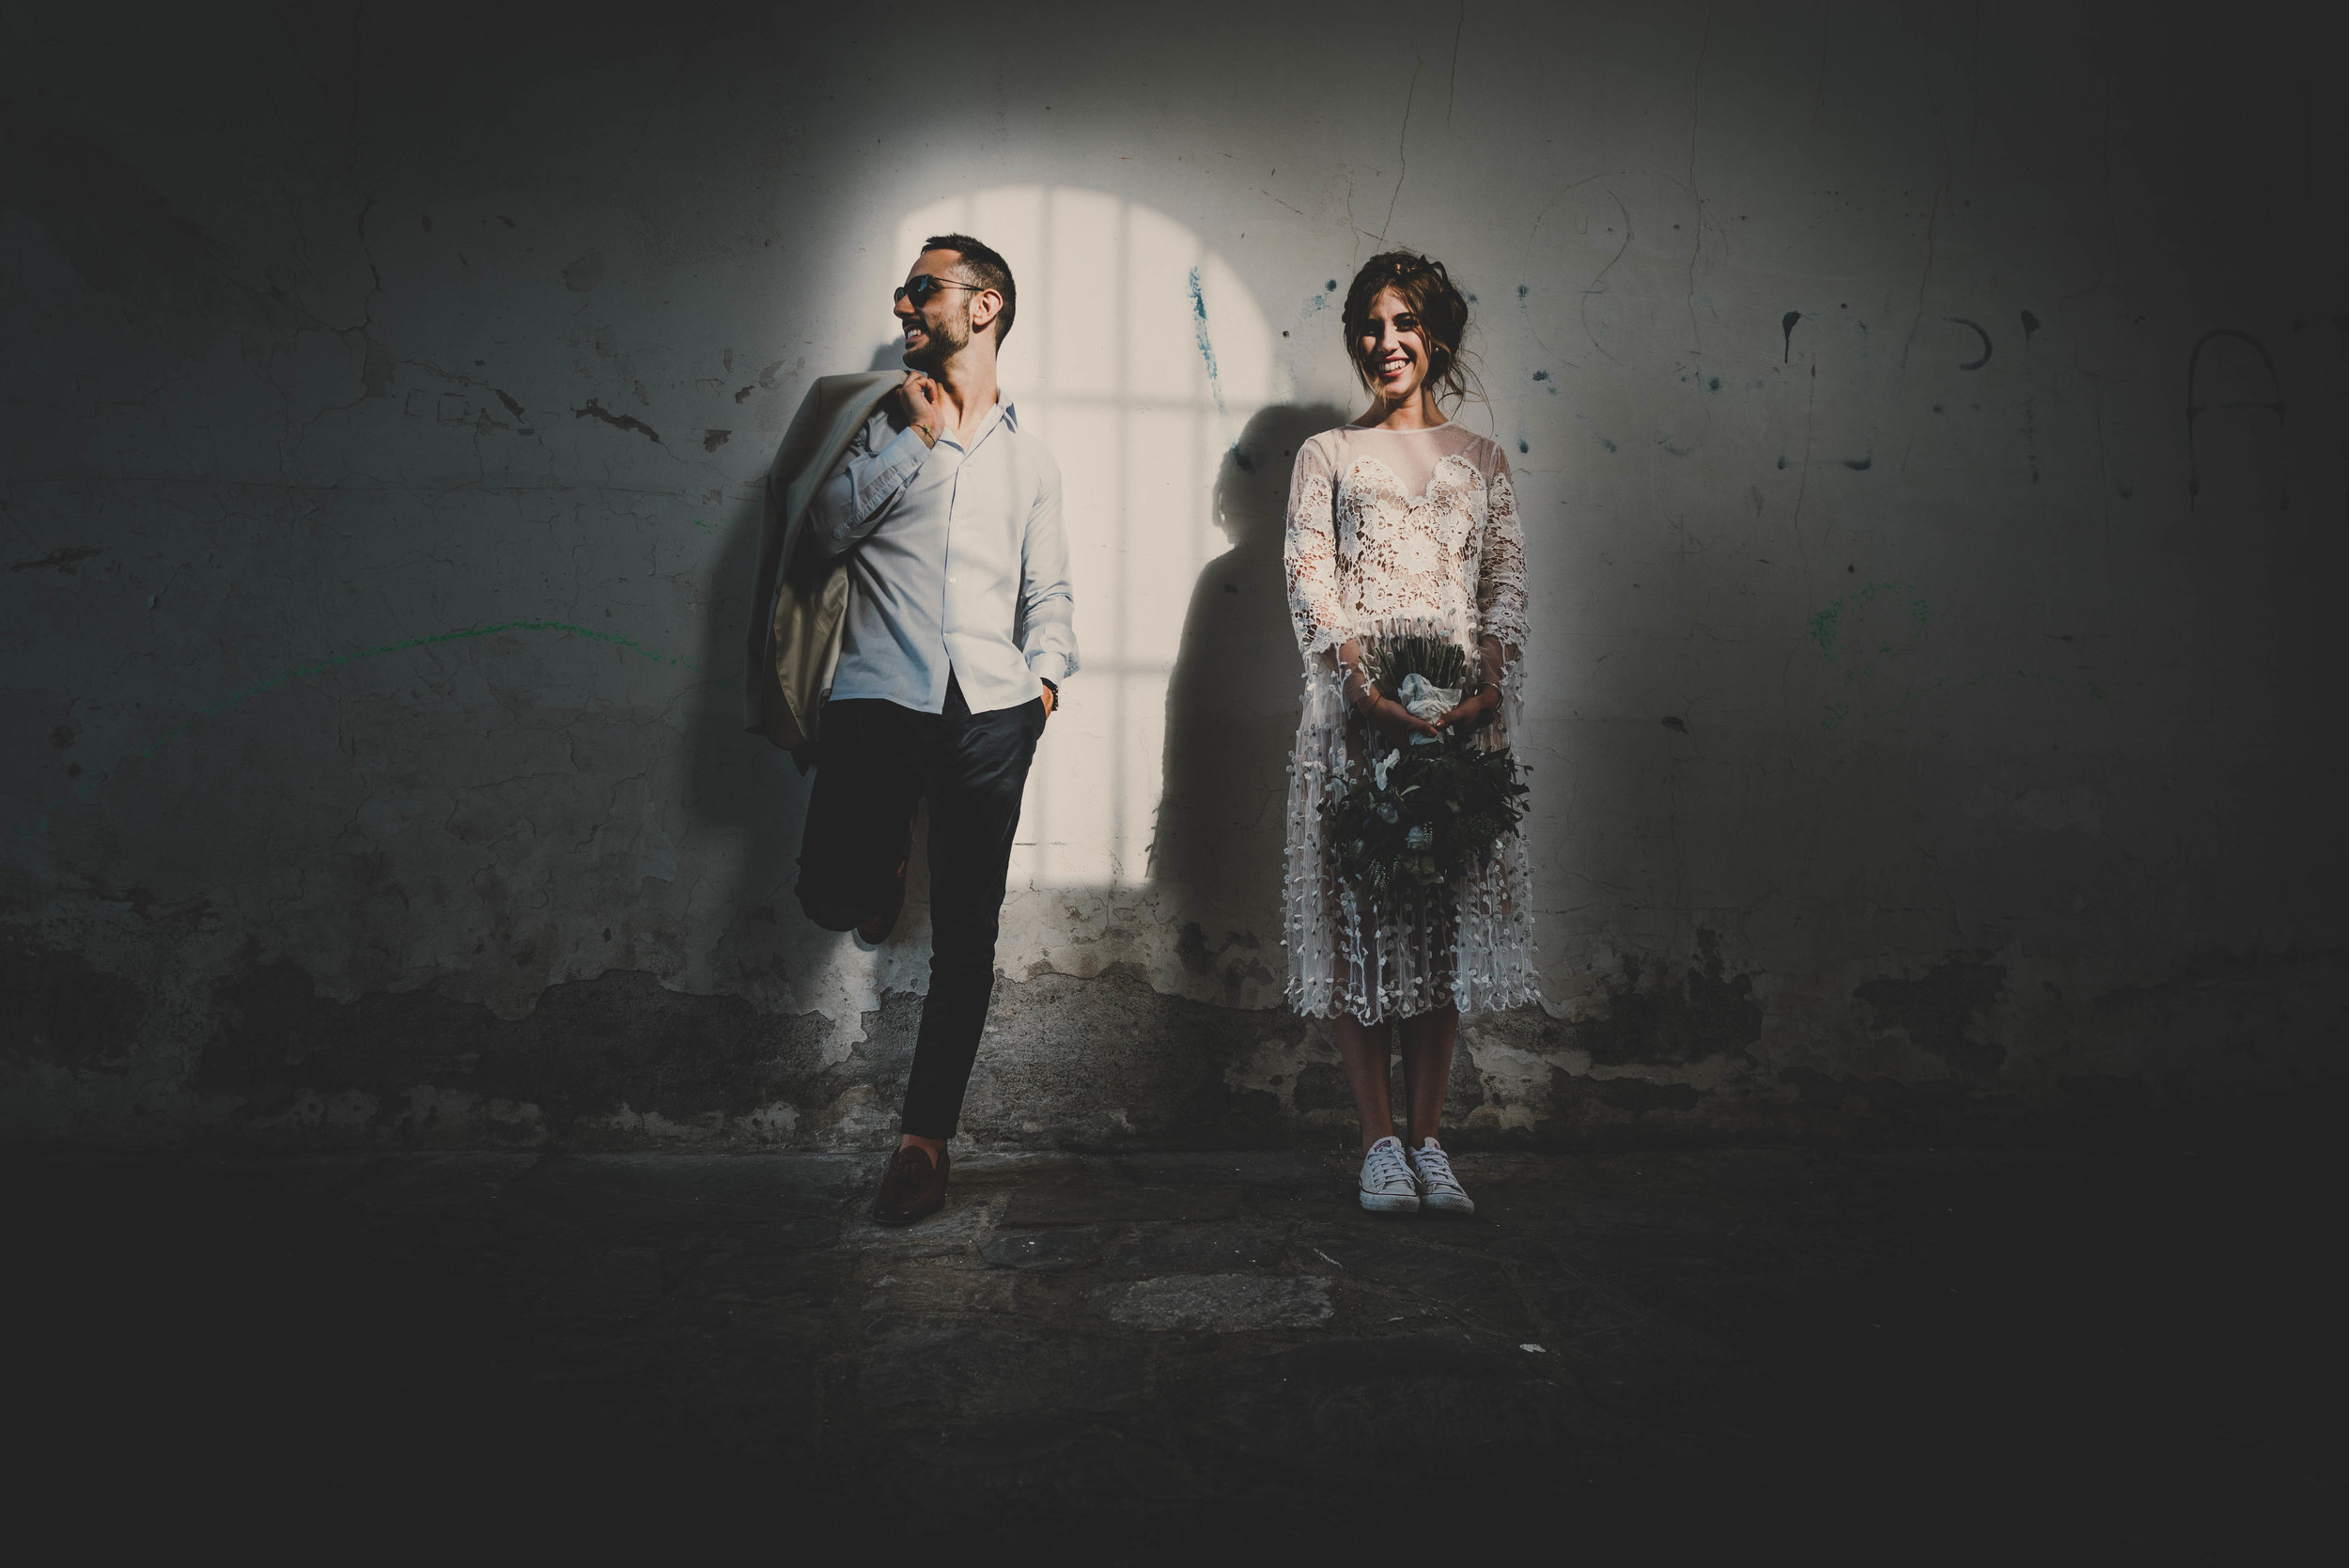 alternative-wedding-elopement (1).jpg